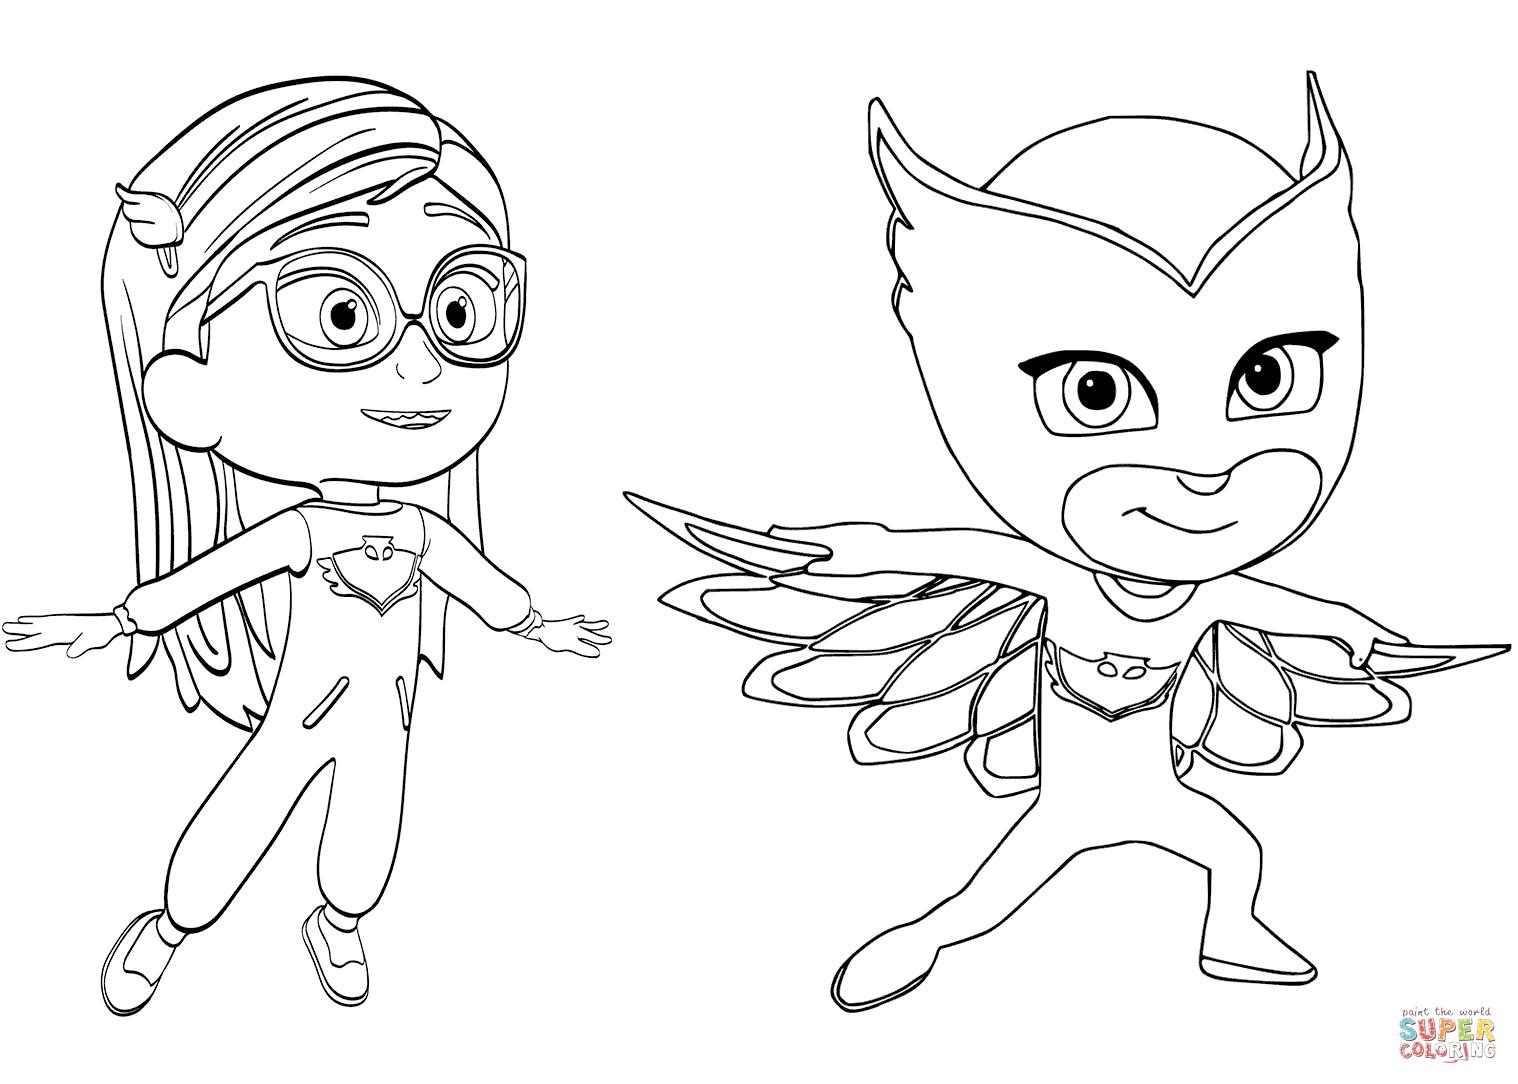 Pajama Hero Amaya Is Owlette From Pj Masks Coloring Page | Free - Free Printable Pajama Coloring Pages